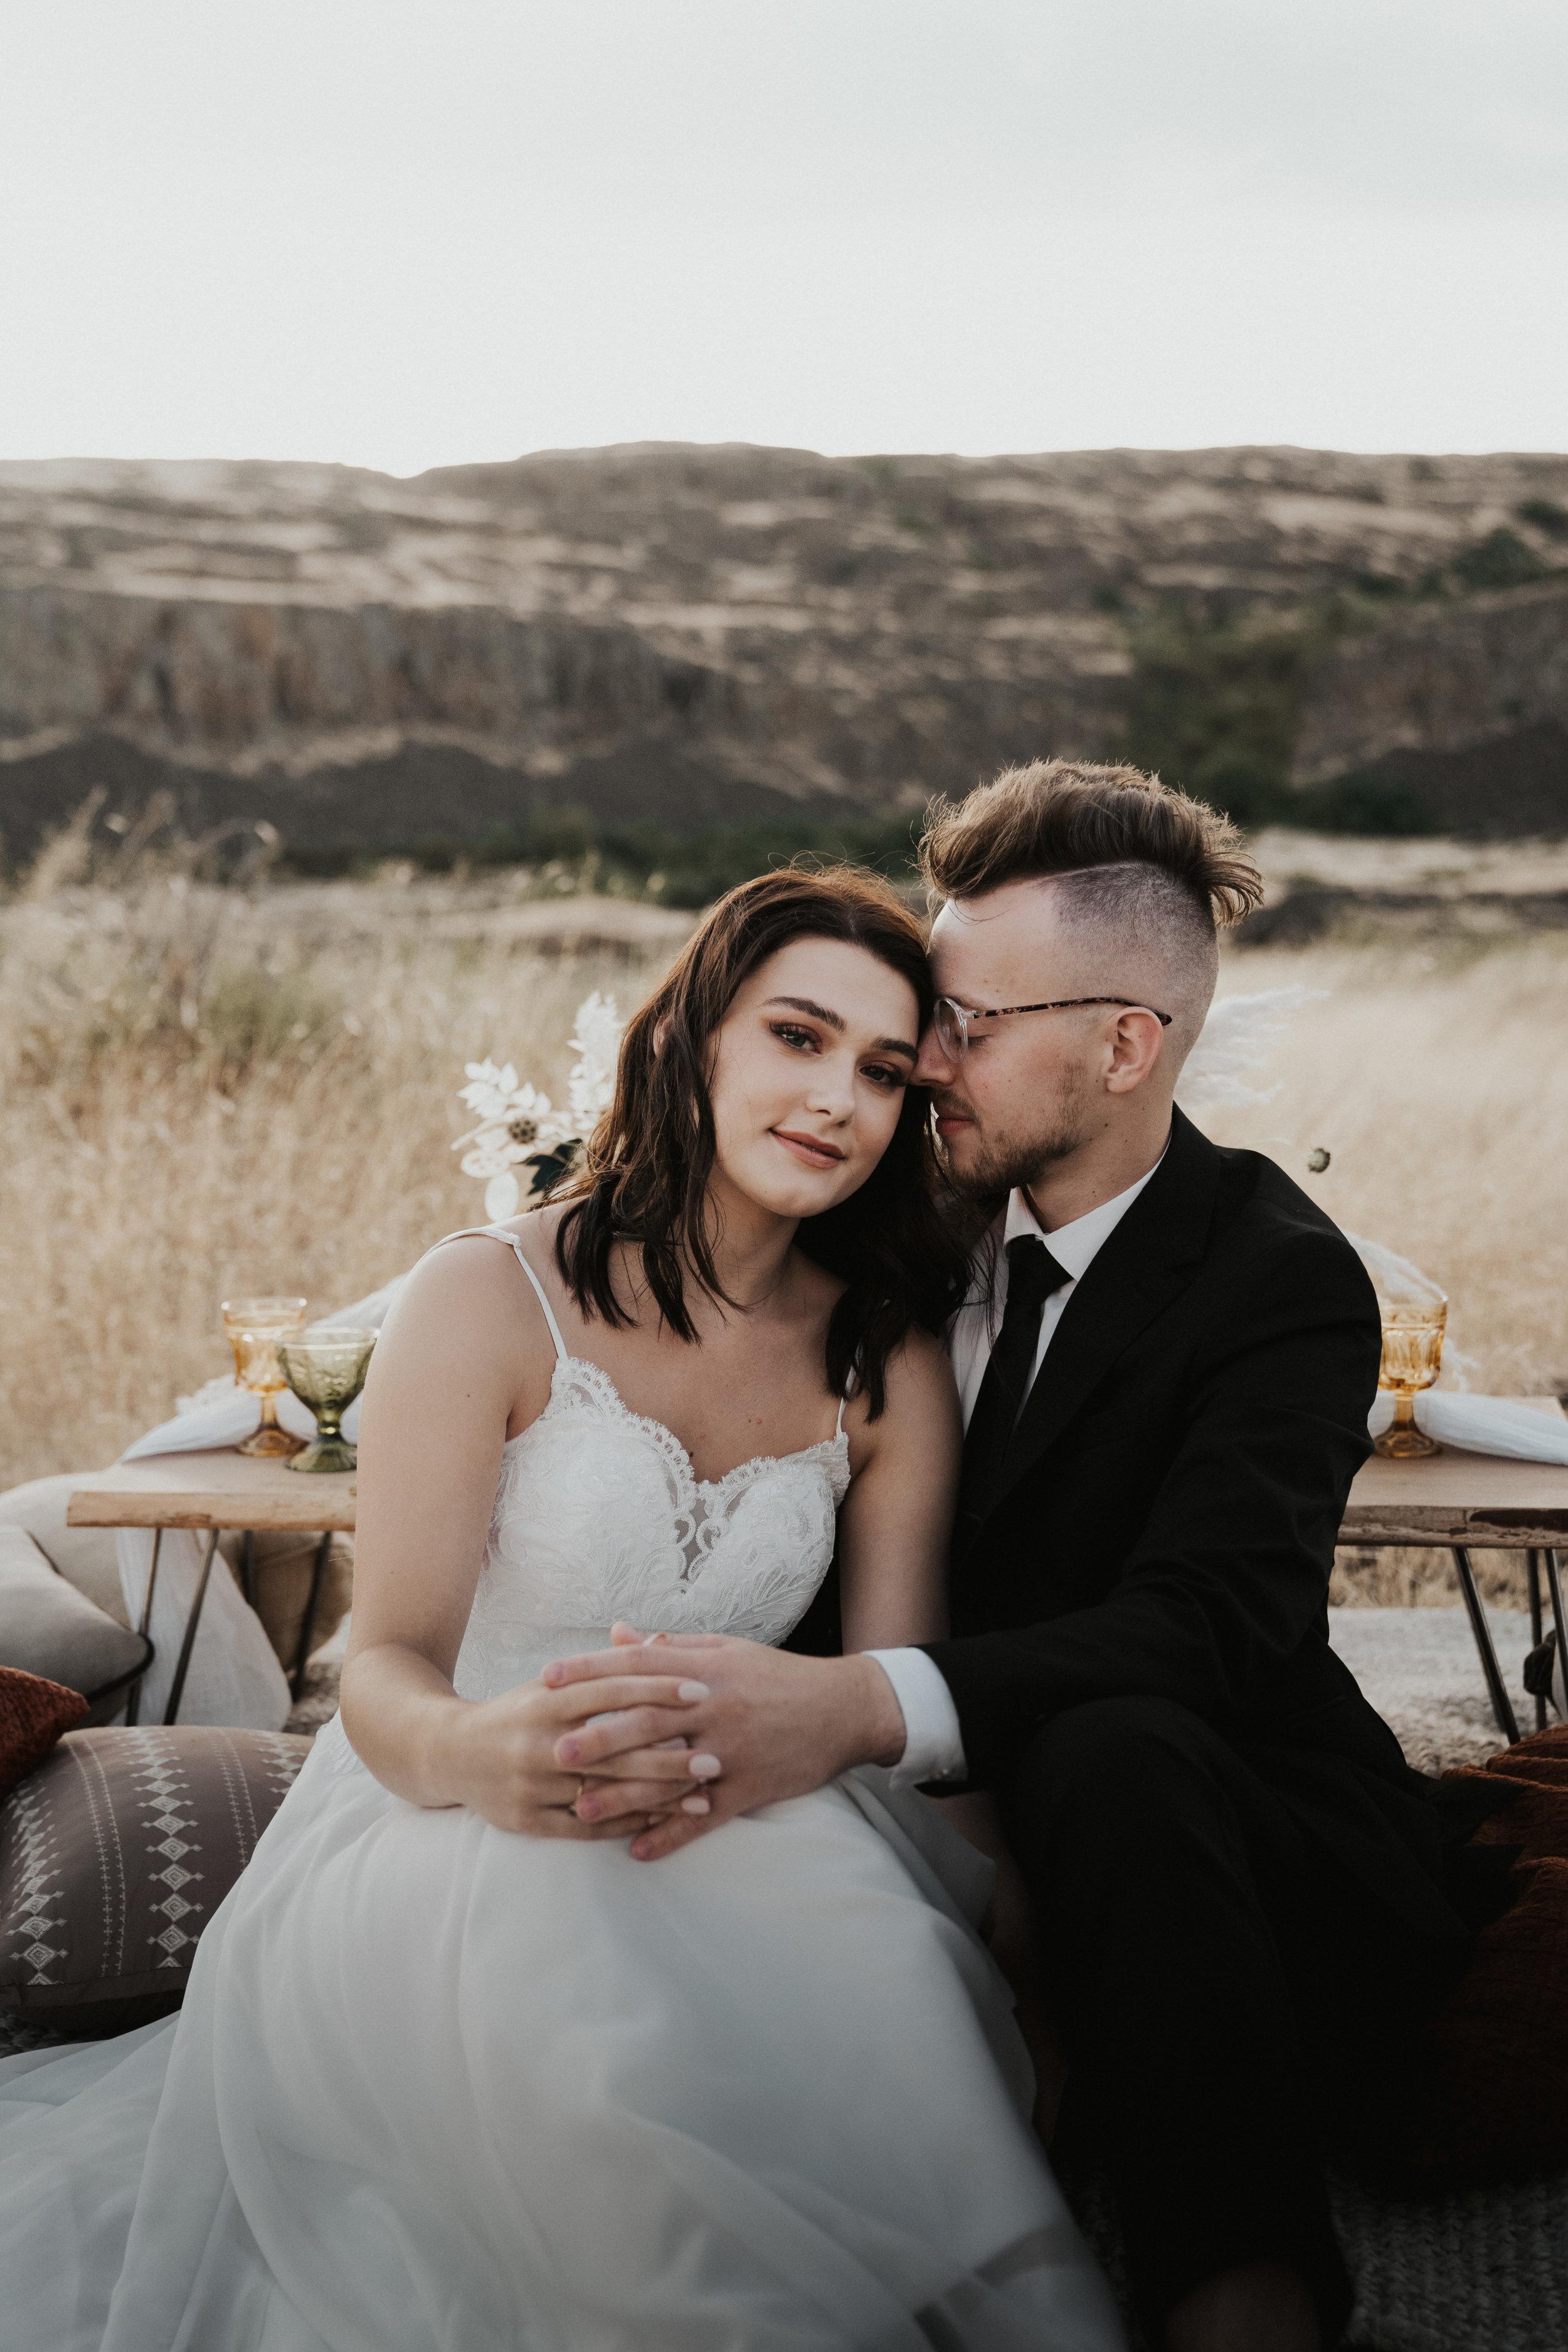 columbia-river-gorge-wedding-elopement-inspiration-3.jpg